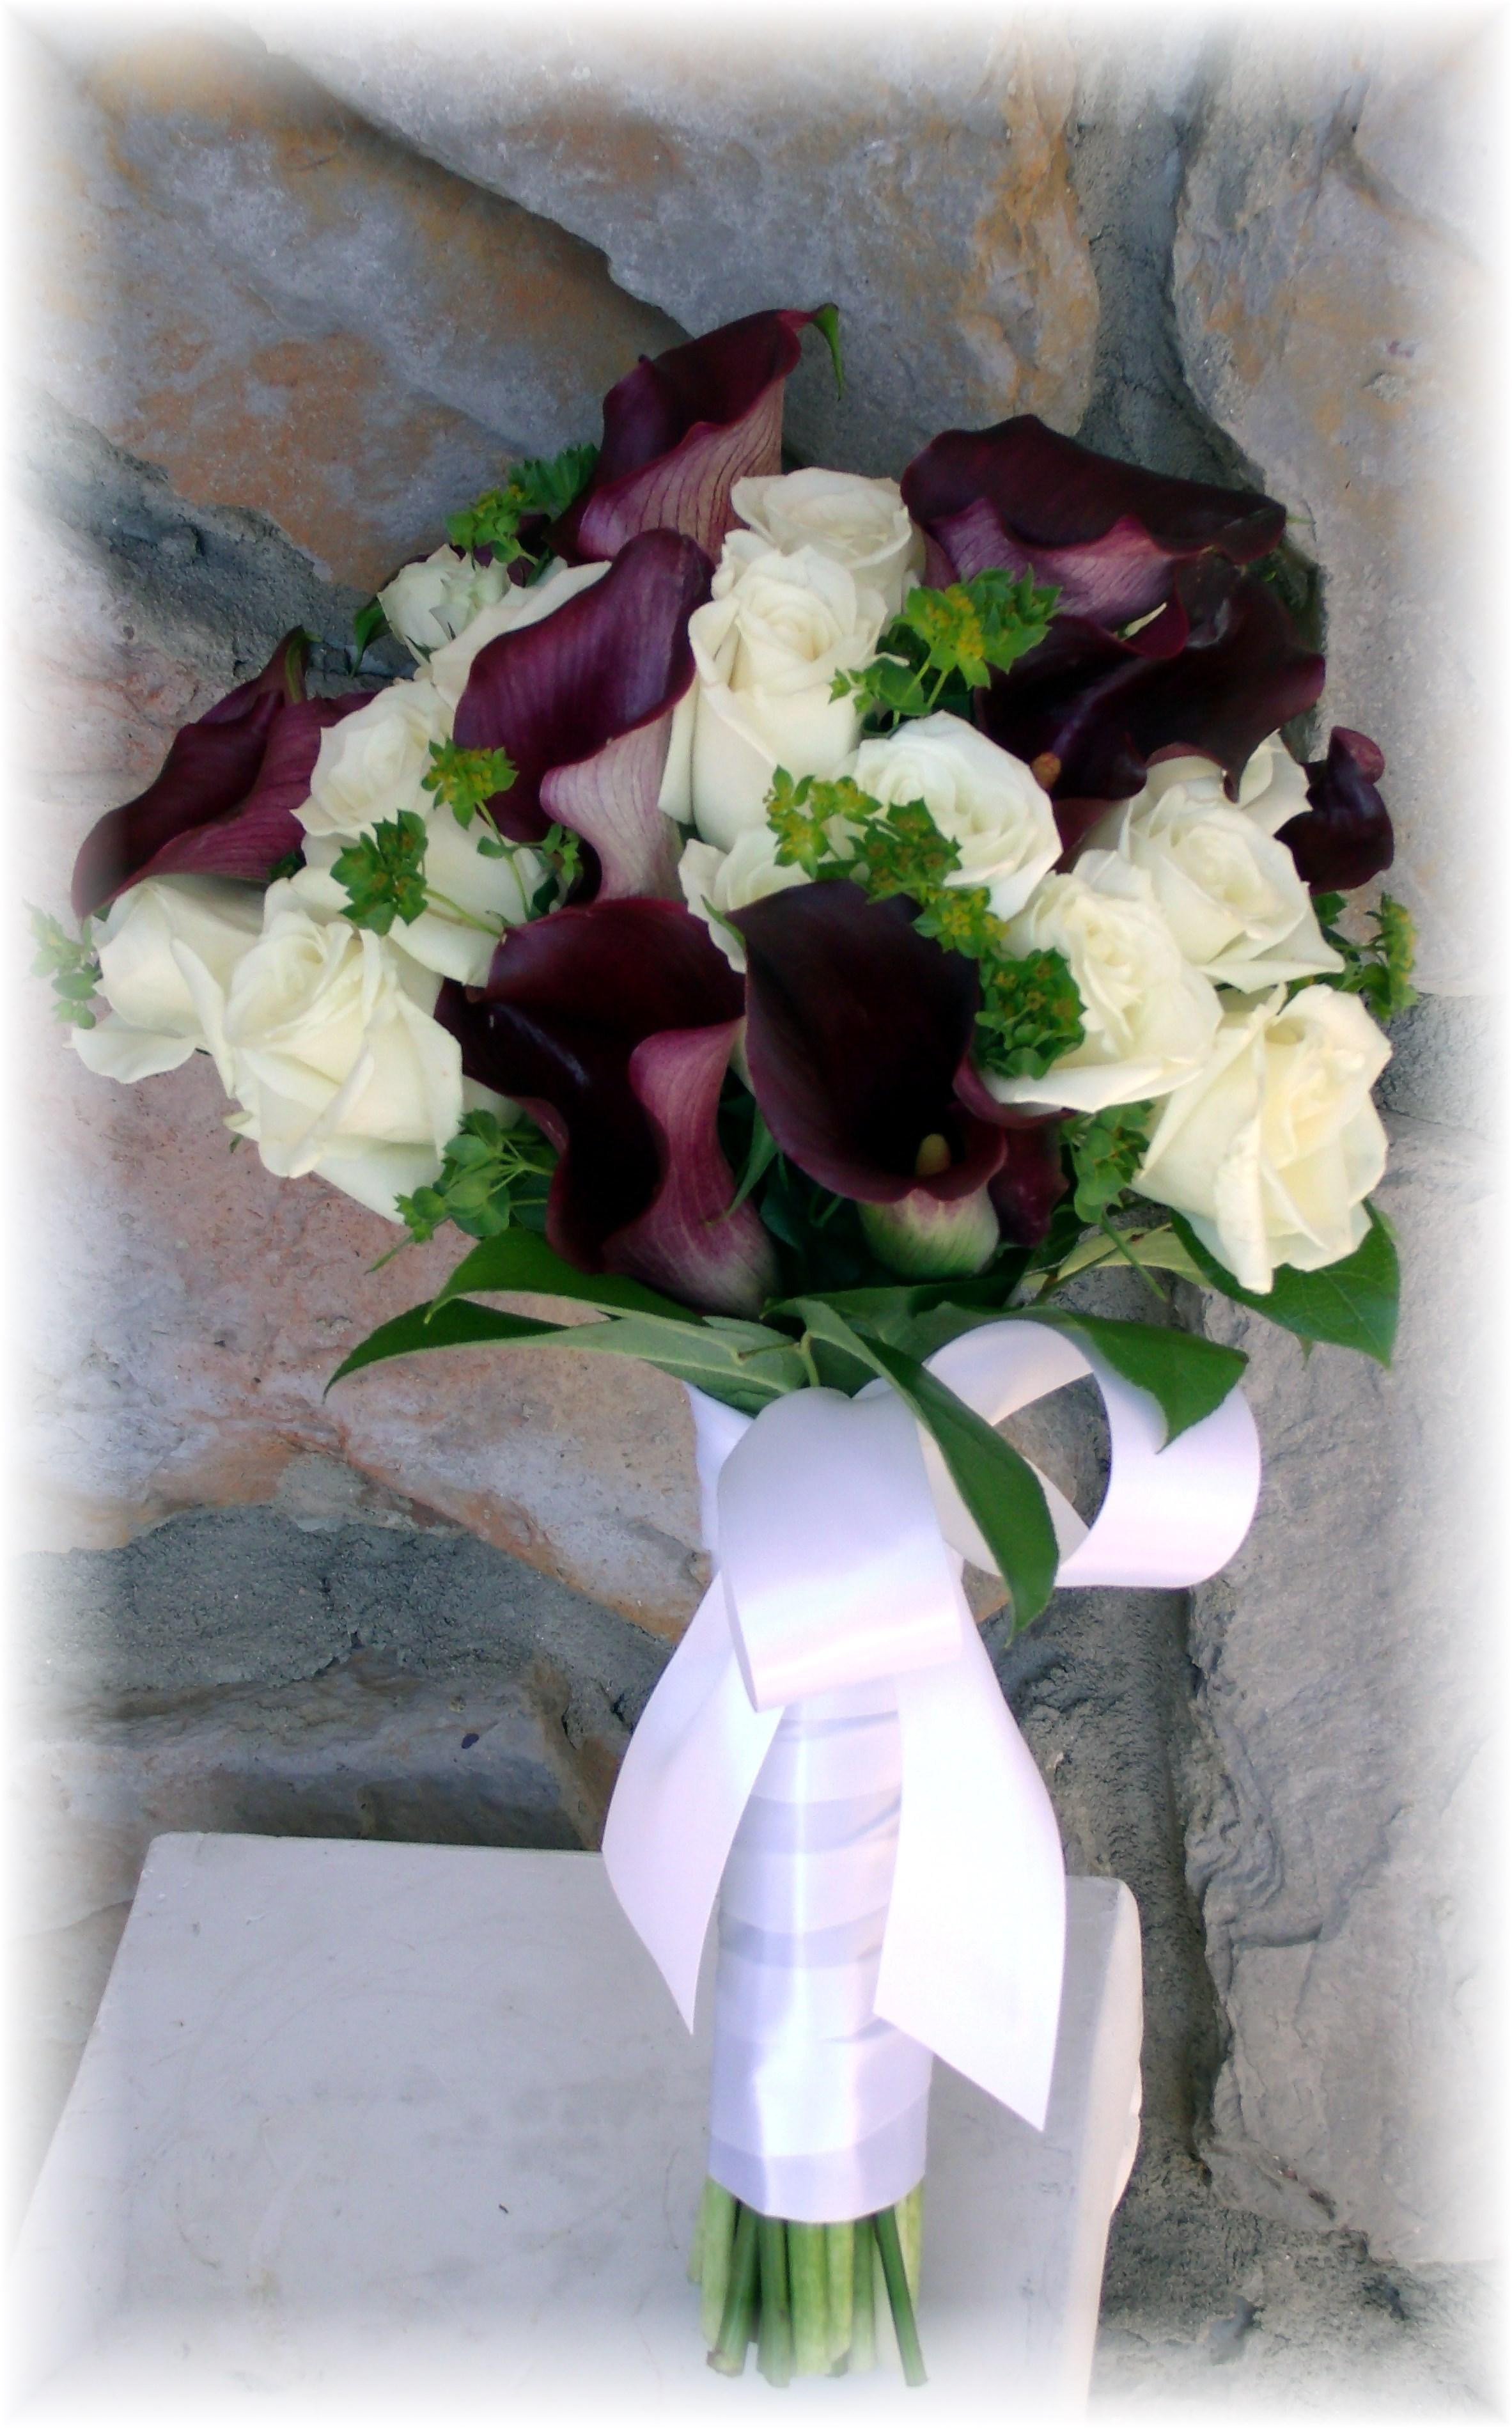 Calla lilies & Roses